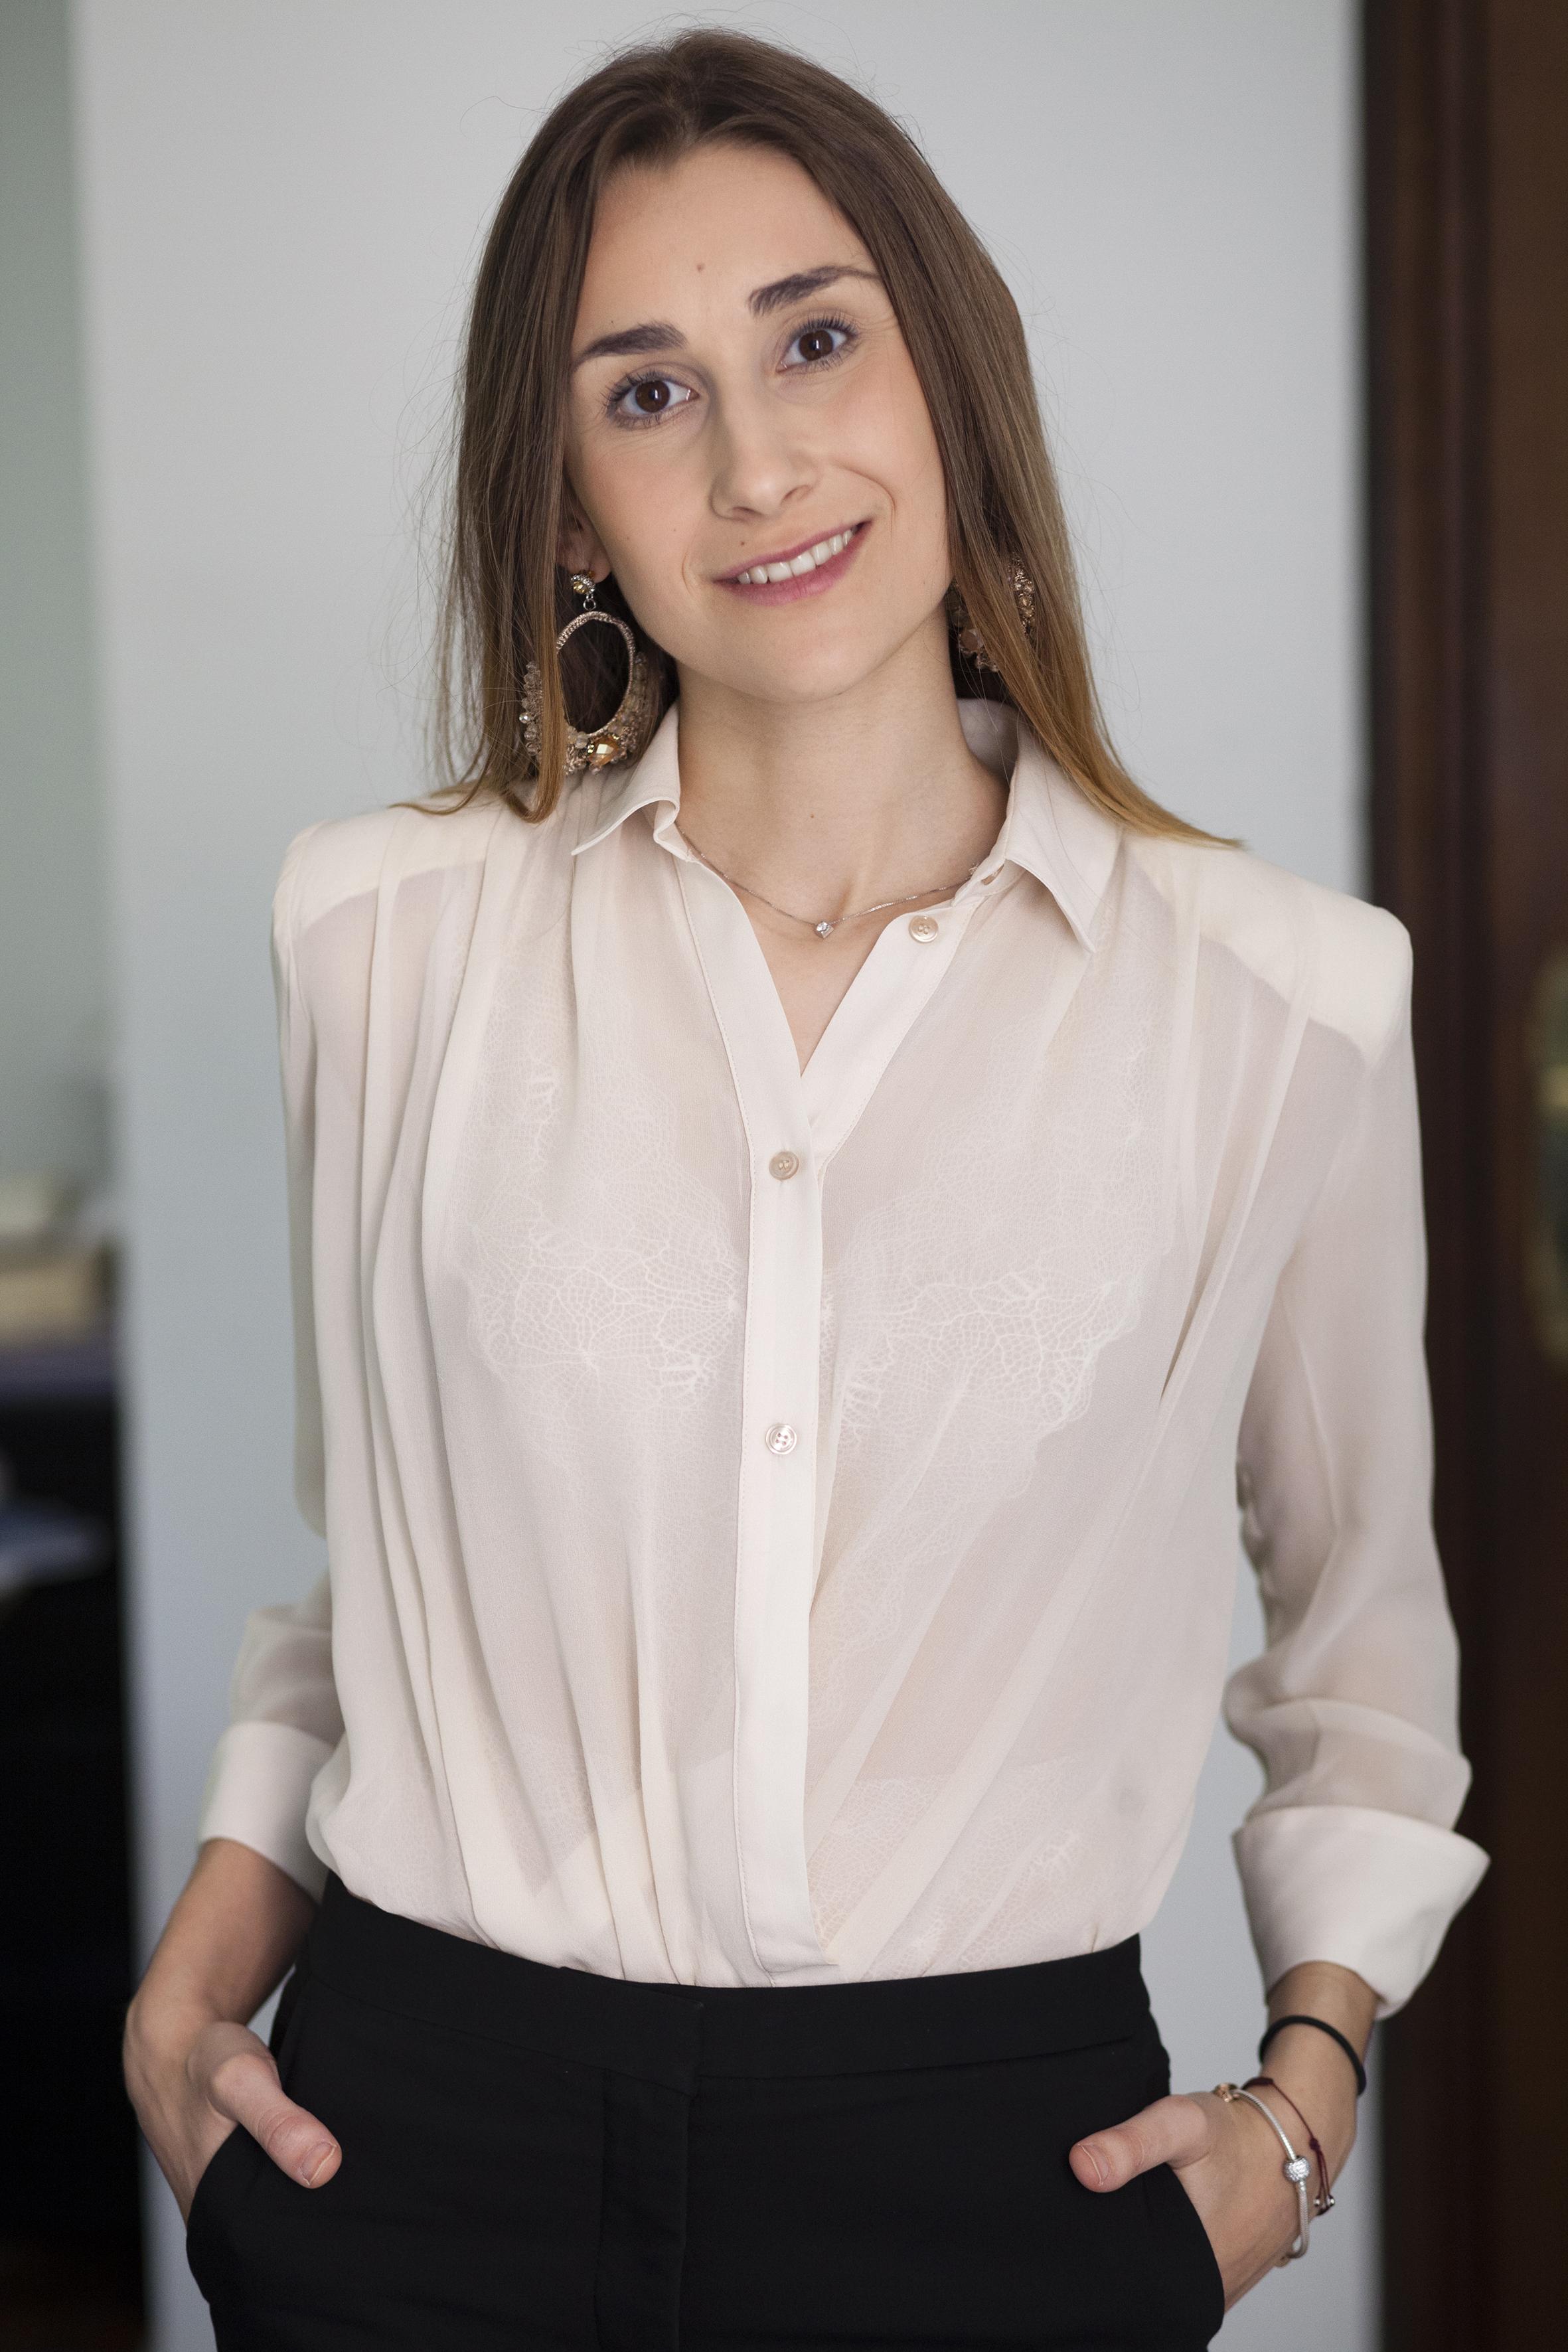 Dott.ssa Beatrice Carrozzo